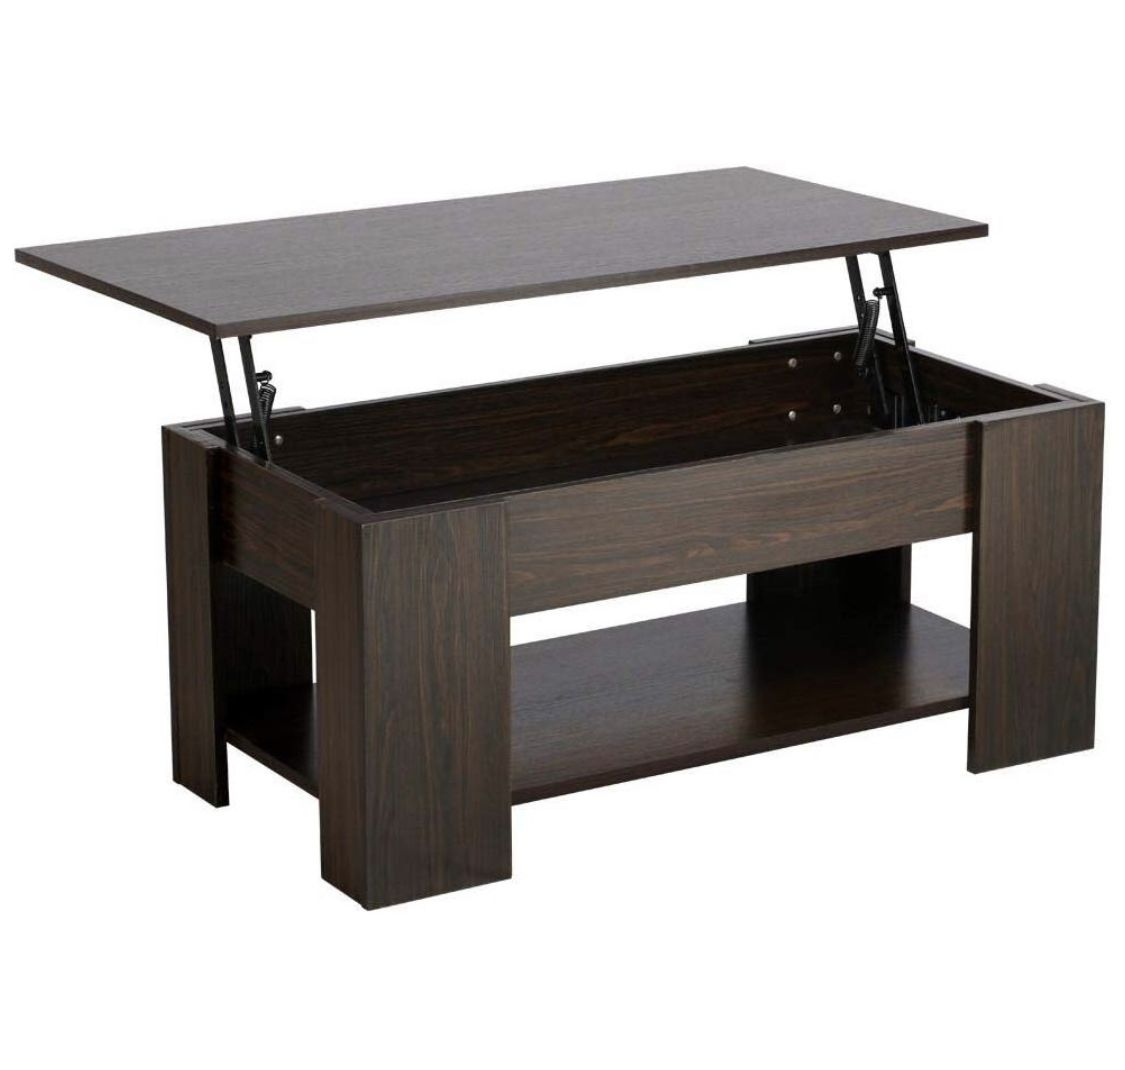 Amazon Home Decor Ideas Kenda Martin In 2020 Coffee Table Coffee Table With Hidden Storage Modern Shelving [ 1070 x 1125 Pixel ]